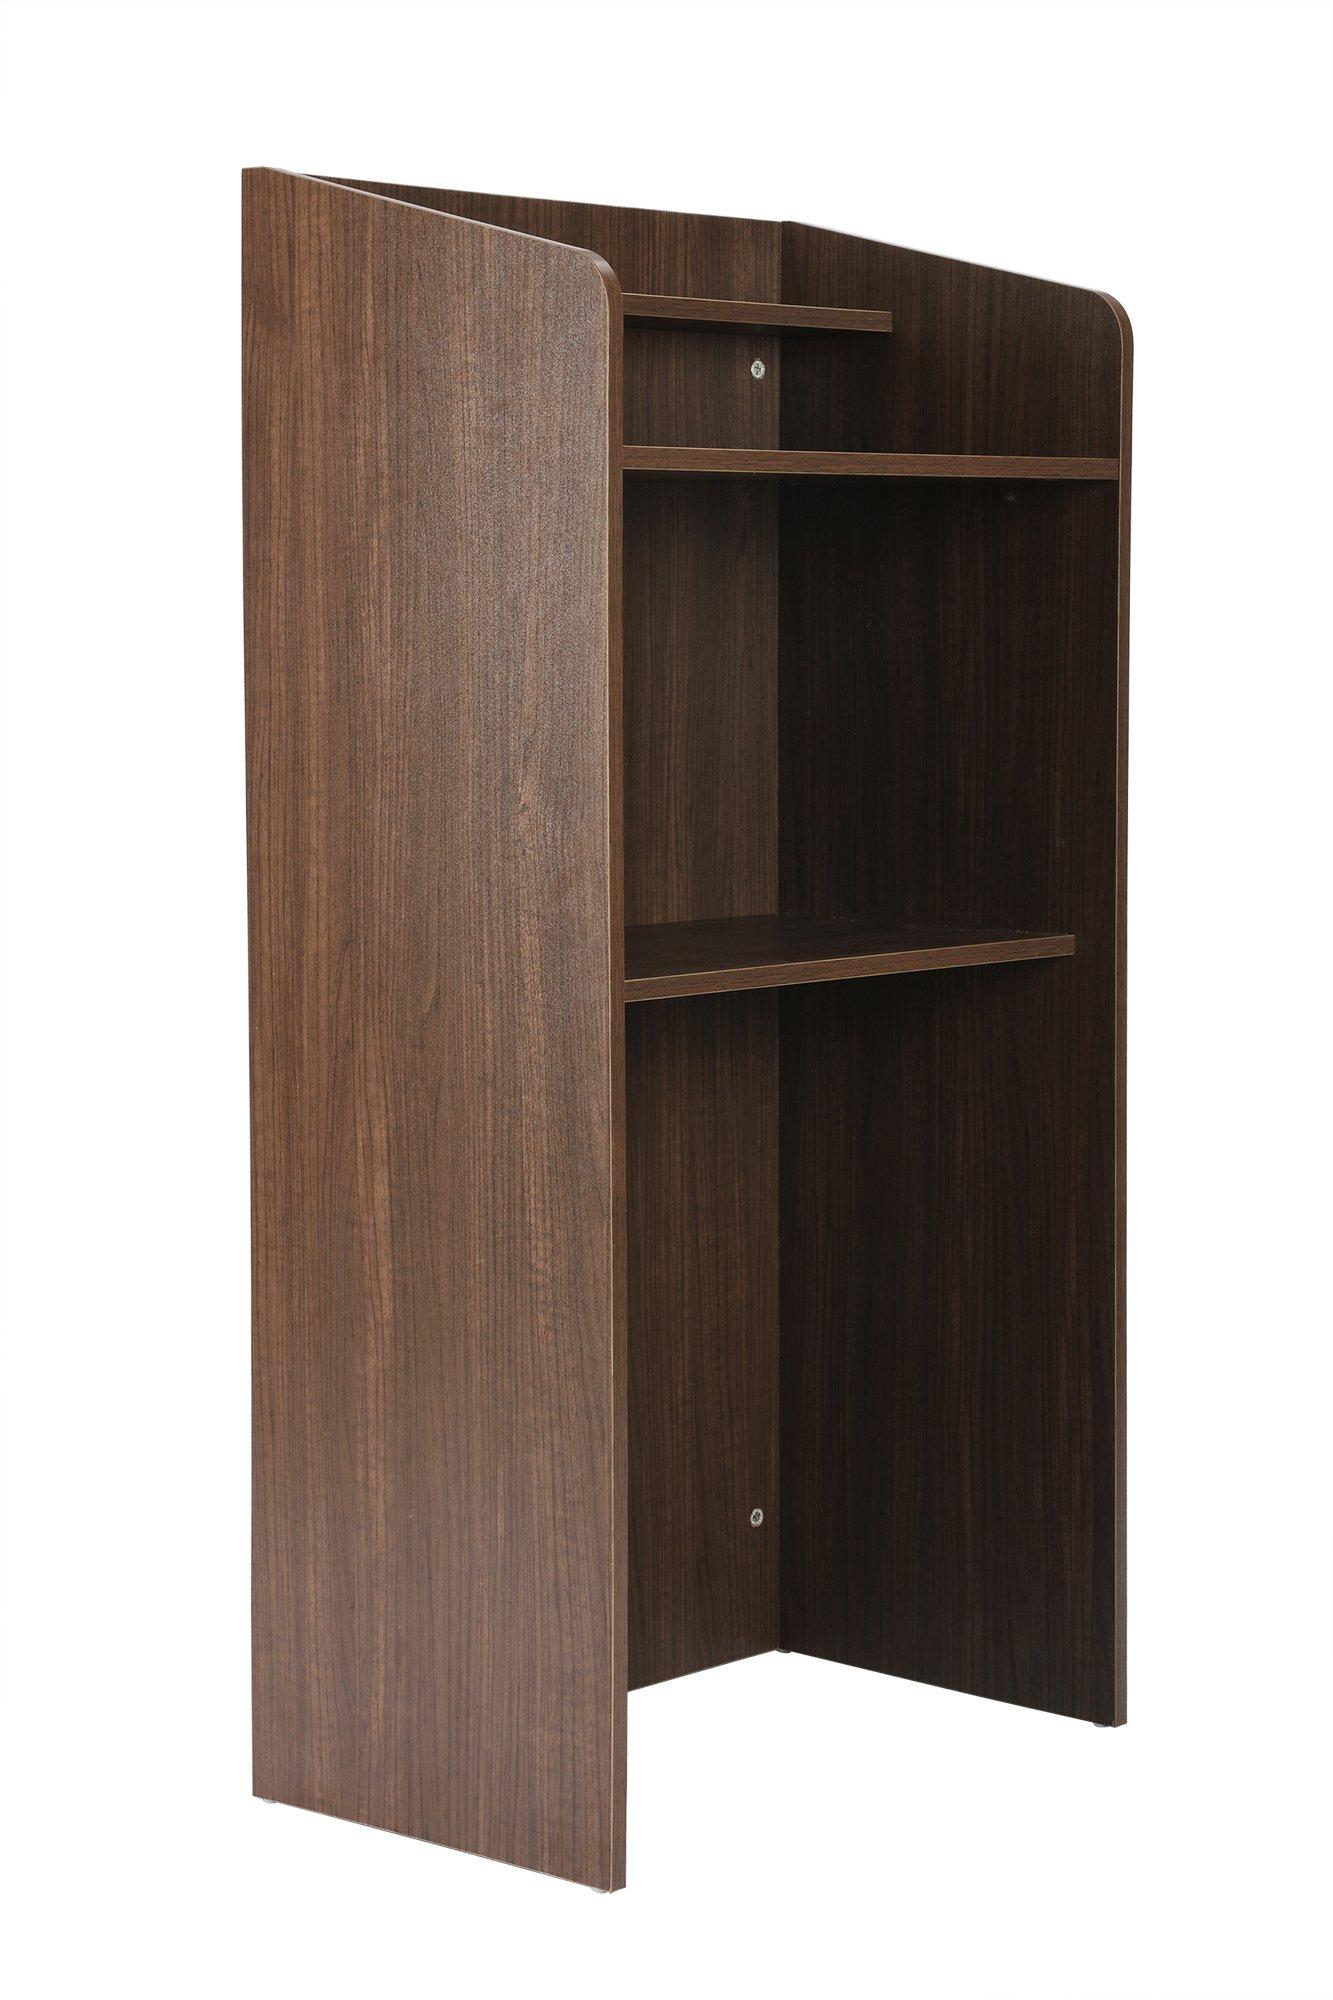 FIVEGIVEN Standing Lectern Podium, Floor Lectern with Shelf Espresso